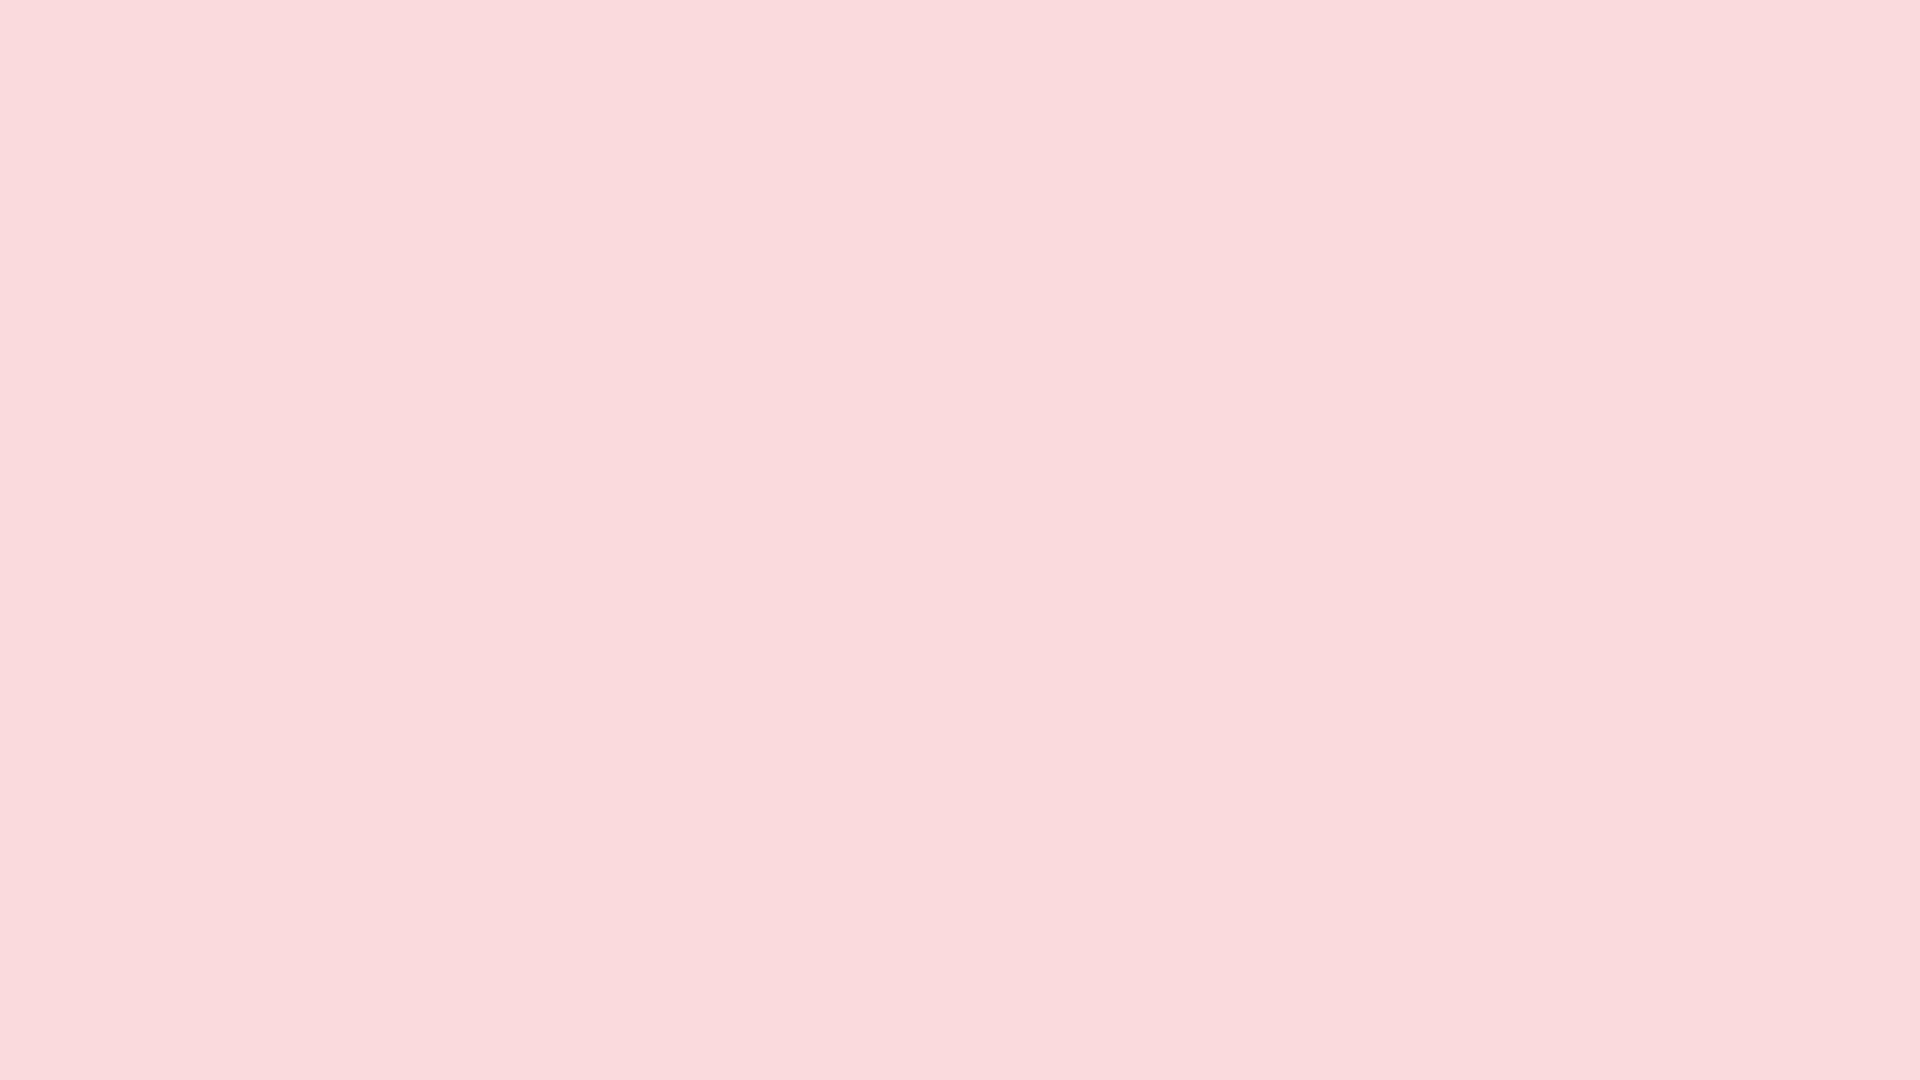 Soft Pink Wallpaper ·① WallpaperTag